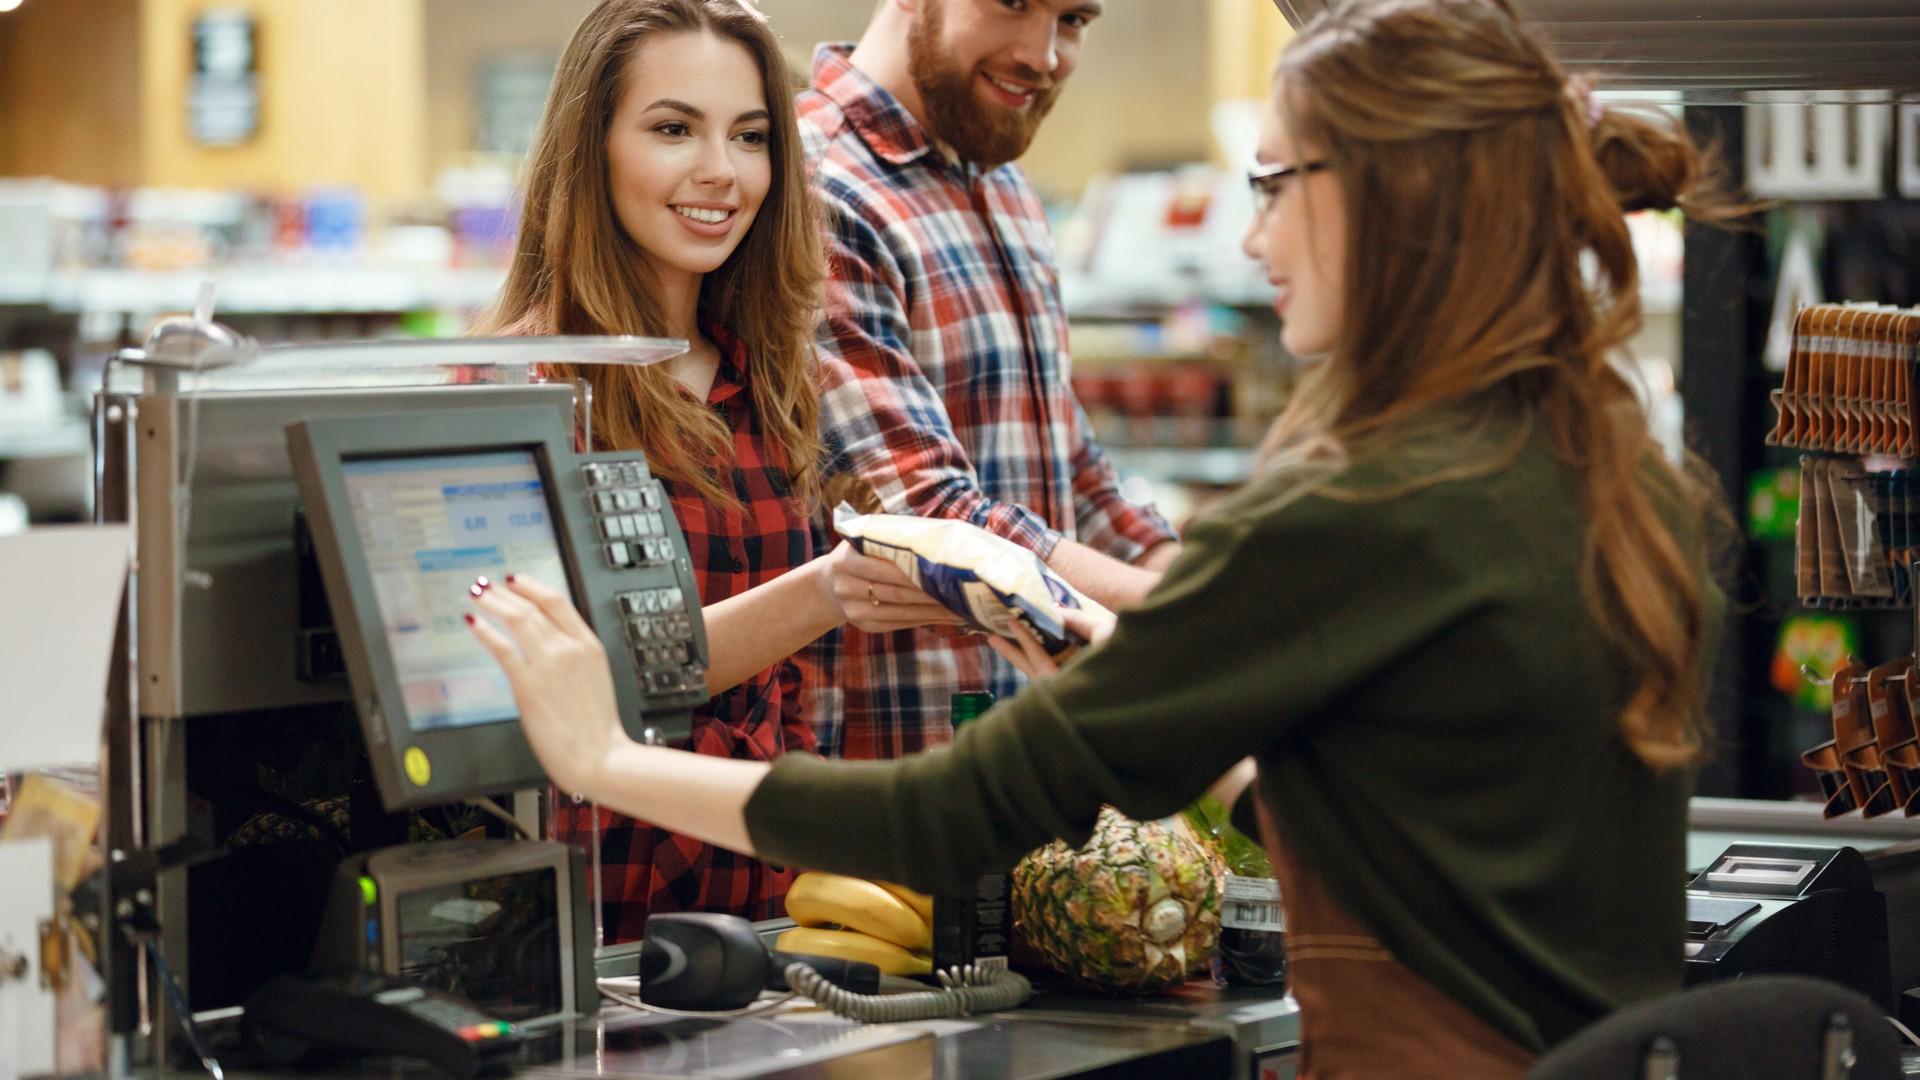 Cash-handling-retail-supermarket-16-9